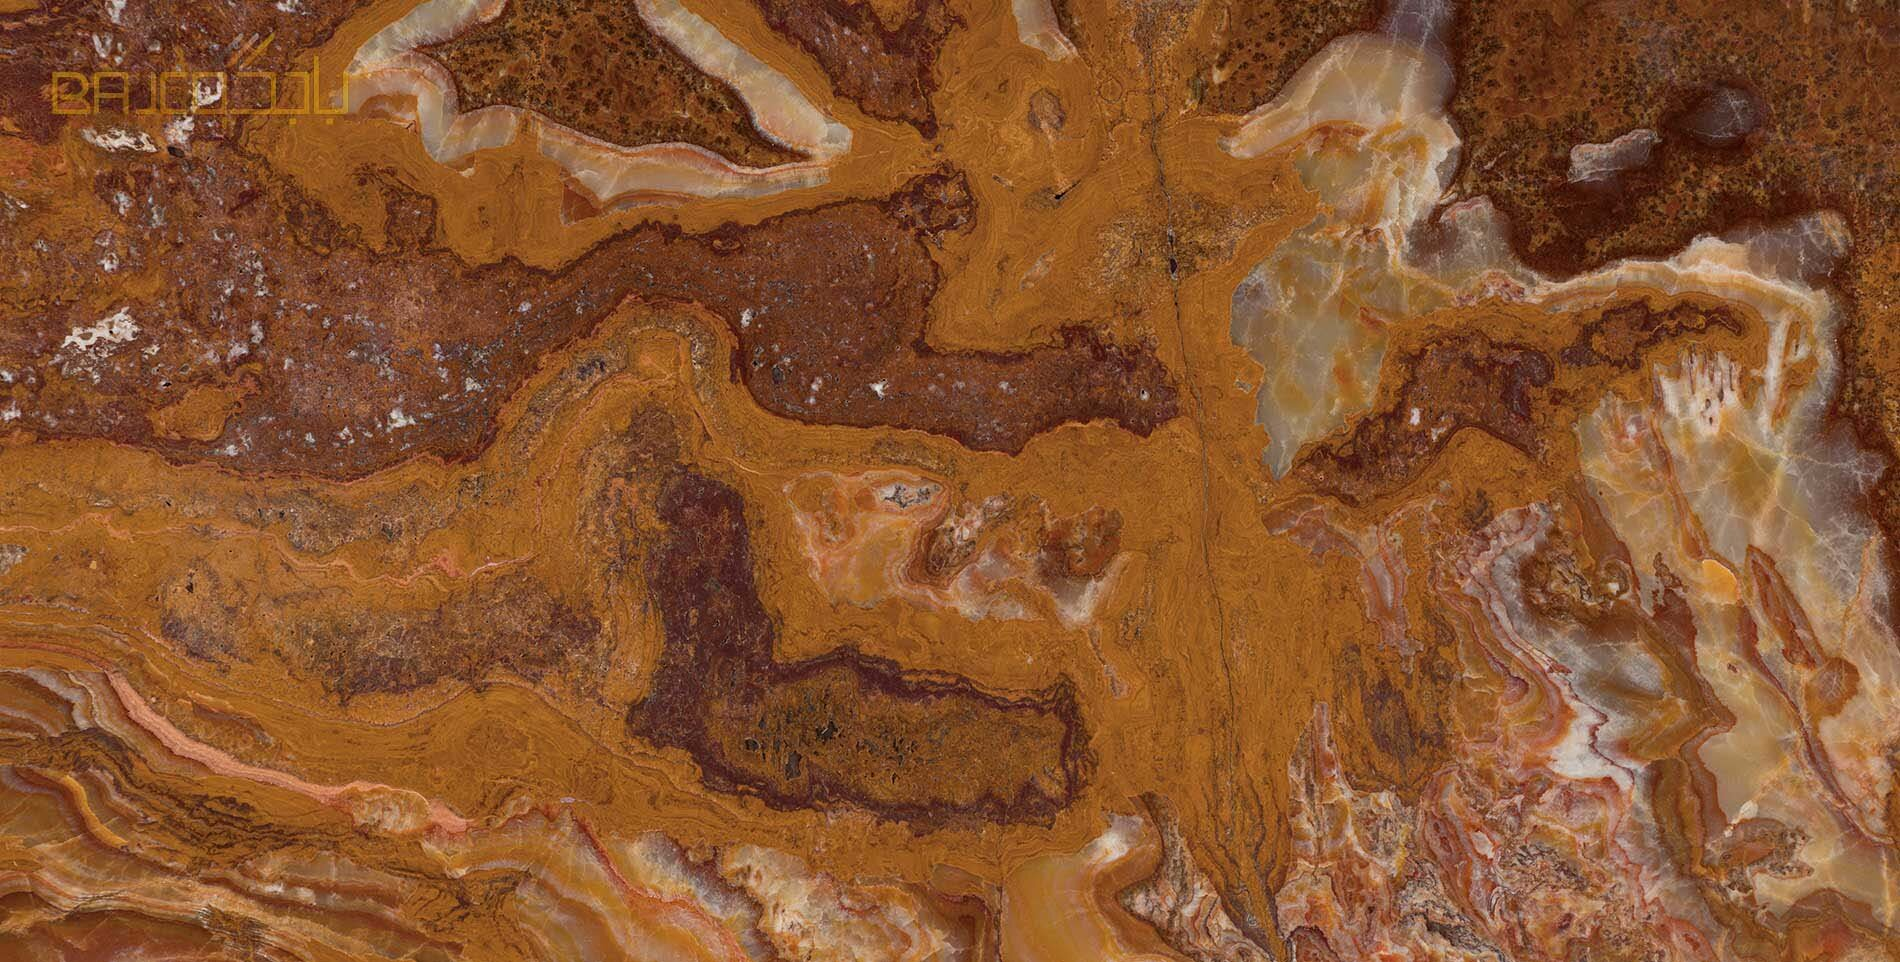 Jurassic-Brown-Onyx جوريزيك براون اونيكس